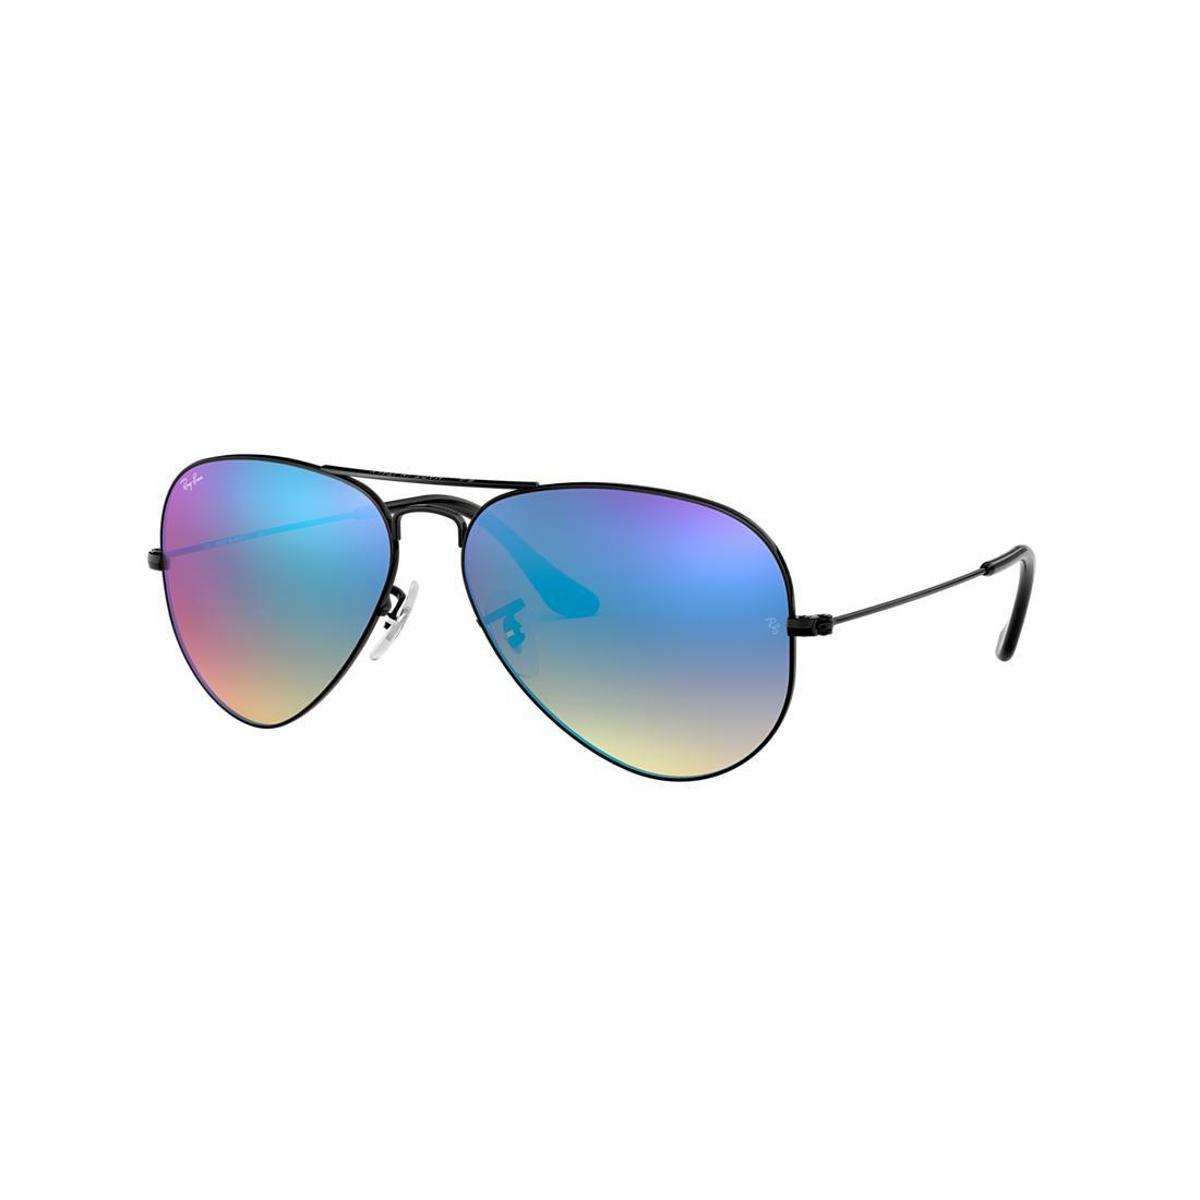 Óculos de Sol Ray-Ban RB3025 Aviator Gradiente Espelhado - Compre Agora    Netshoes 5d8642d9ed